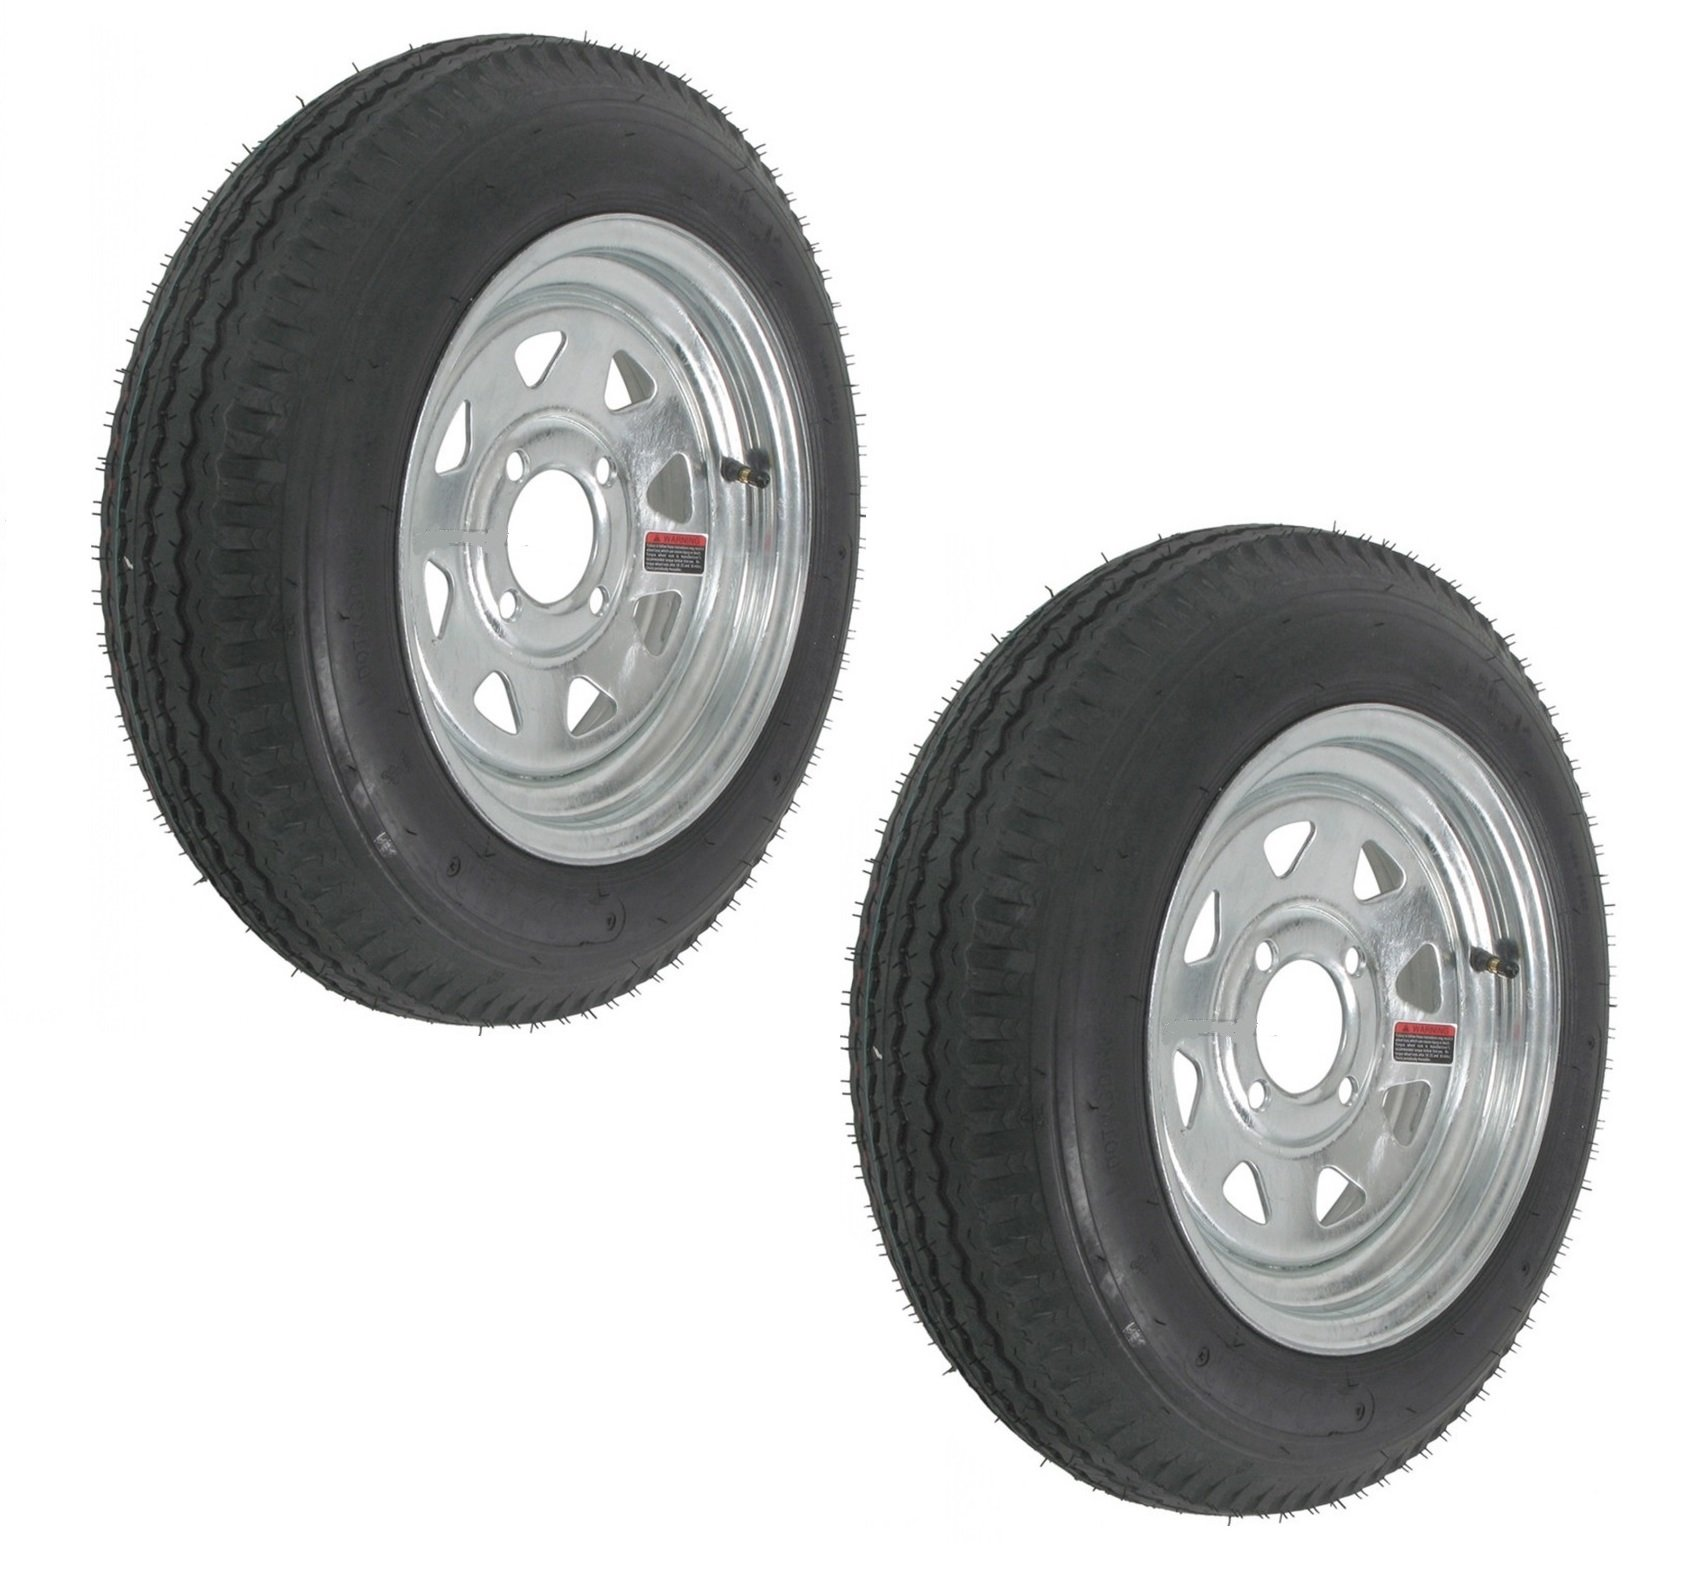 eCustomRim 2-Pk Trailer Tire Rim 4.80-12 12'' Load C 4 Lug Galvanized Spoke 39342